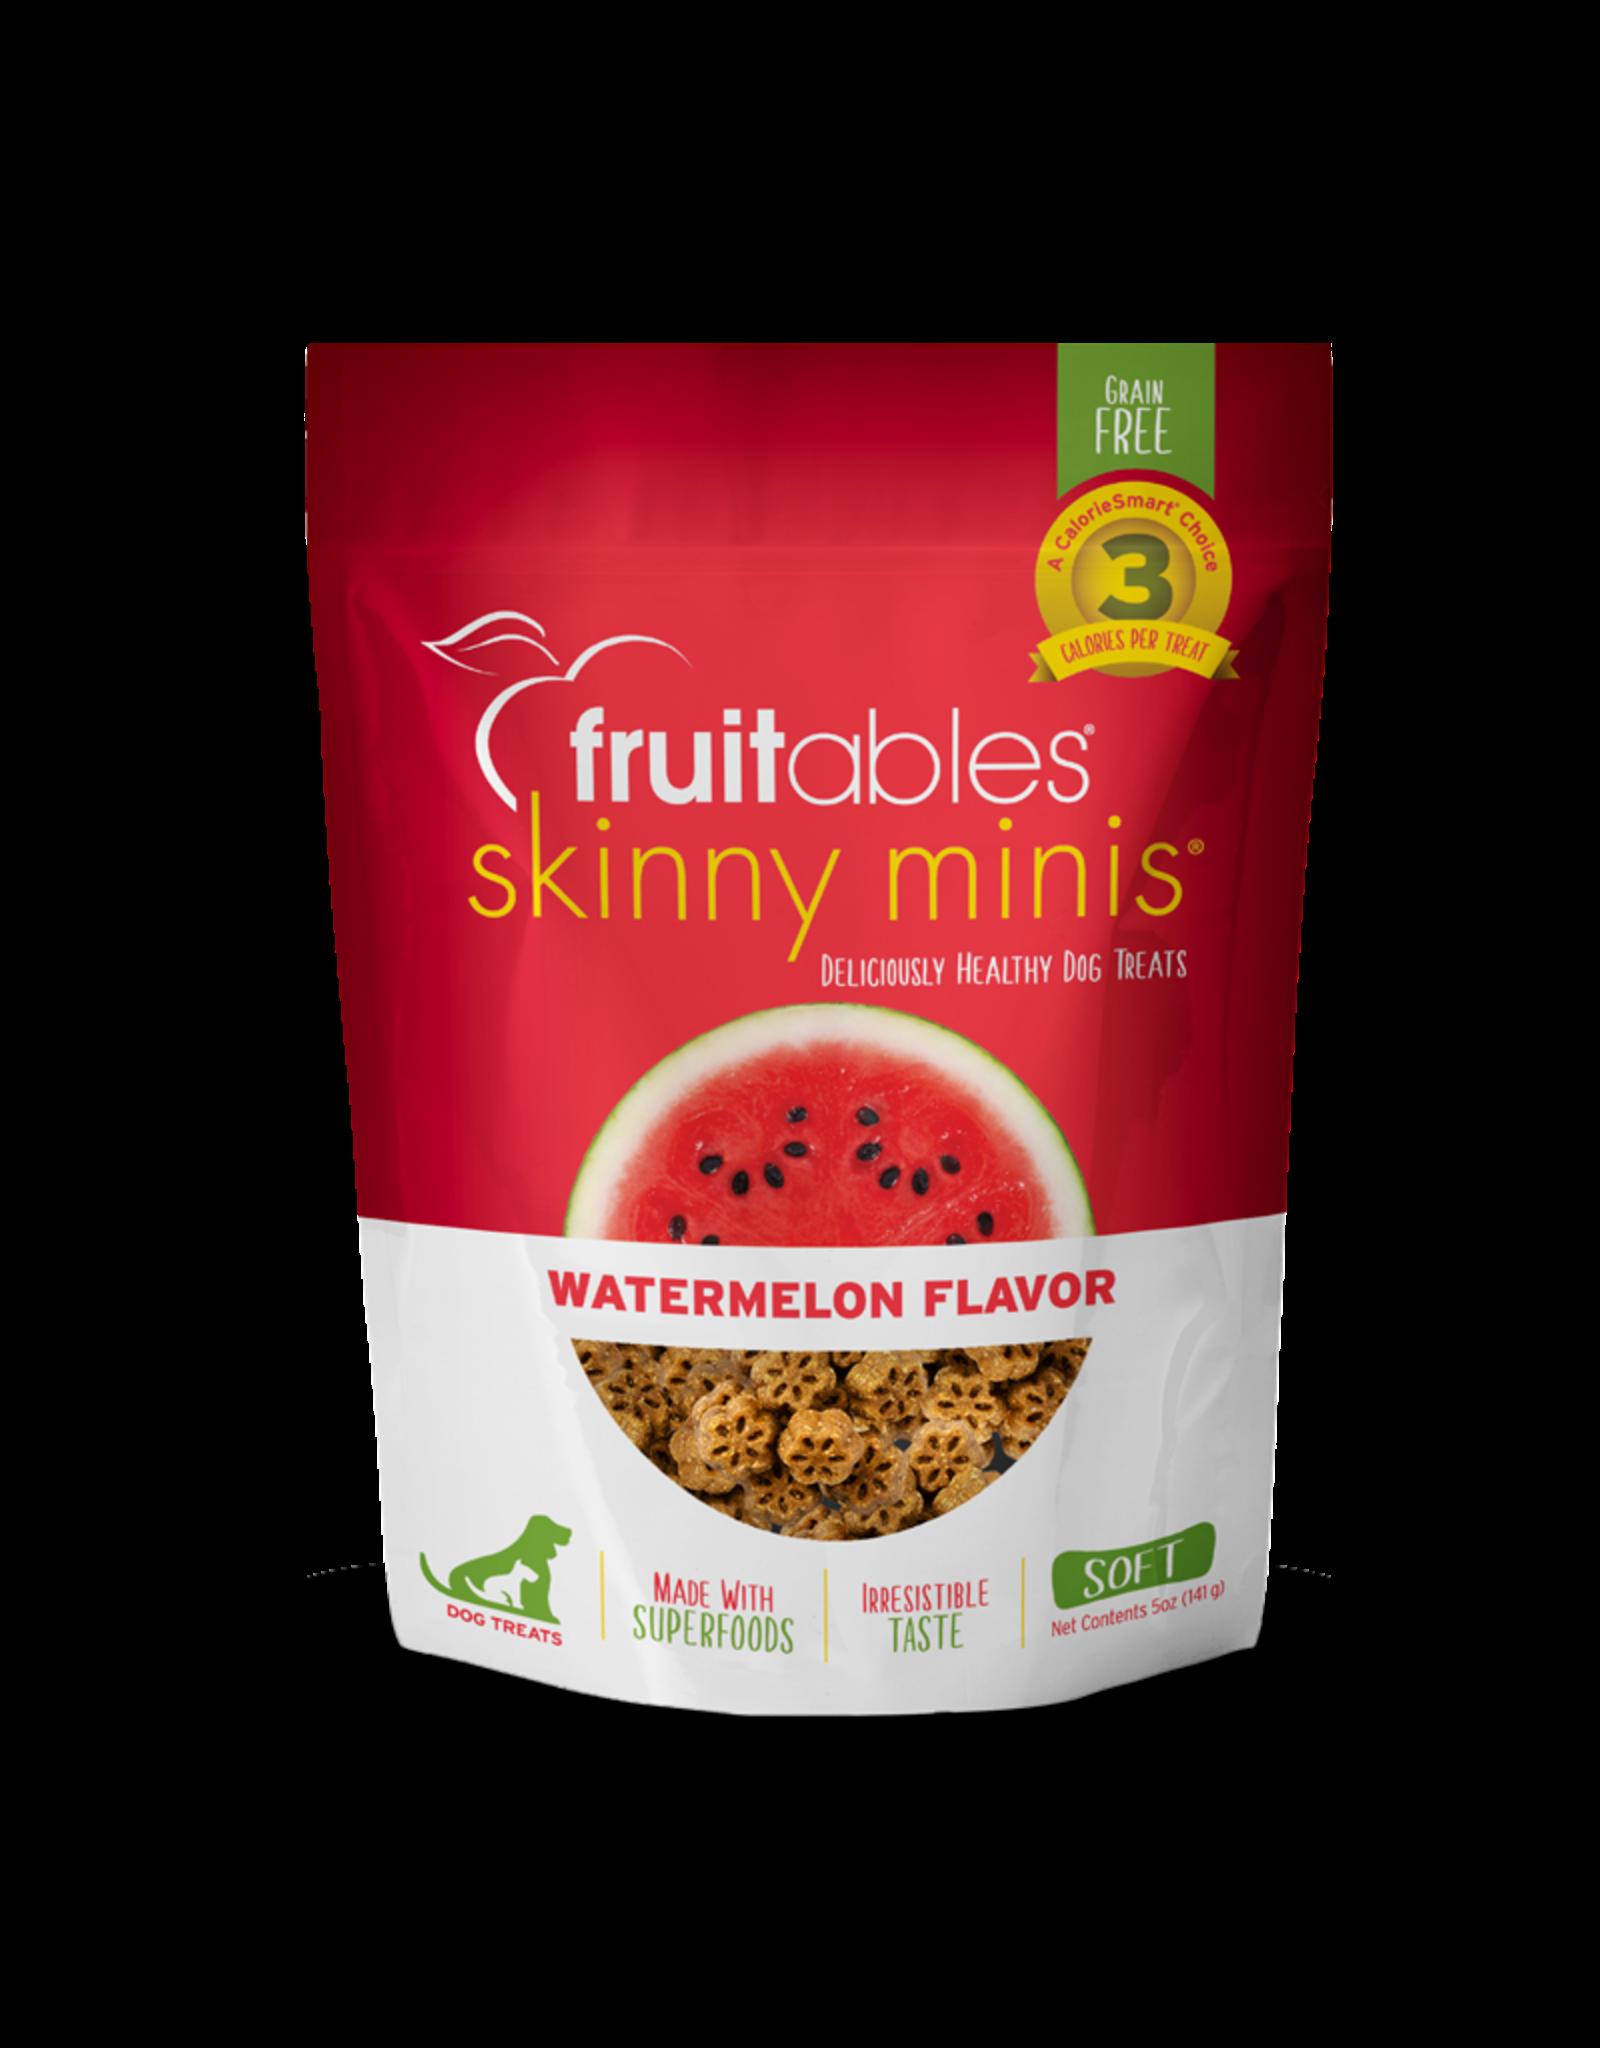 Fruitables Fruitables Skinny Mini's Watermelon 5oz